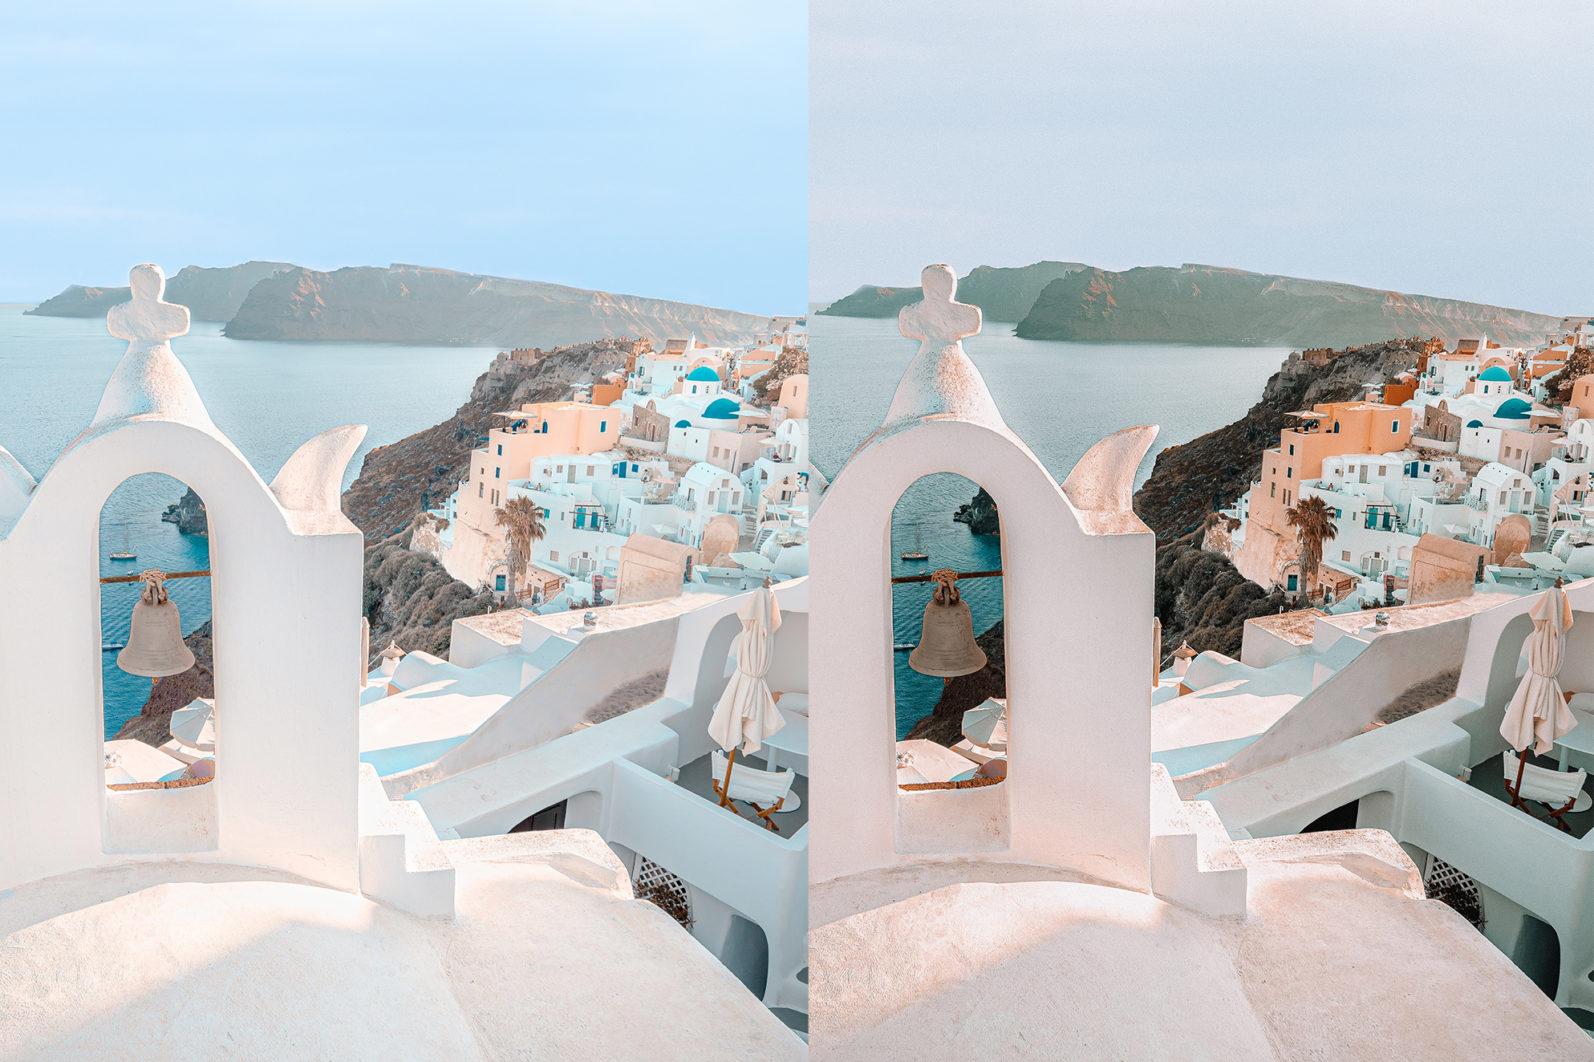 14 x Greece Lightroom Presets   Mobile and Desktop - 4 Greece 1 -